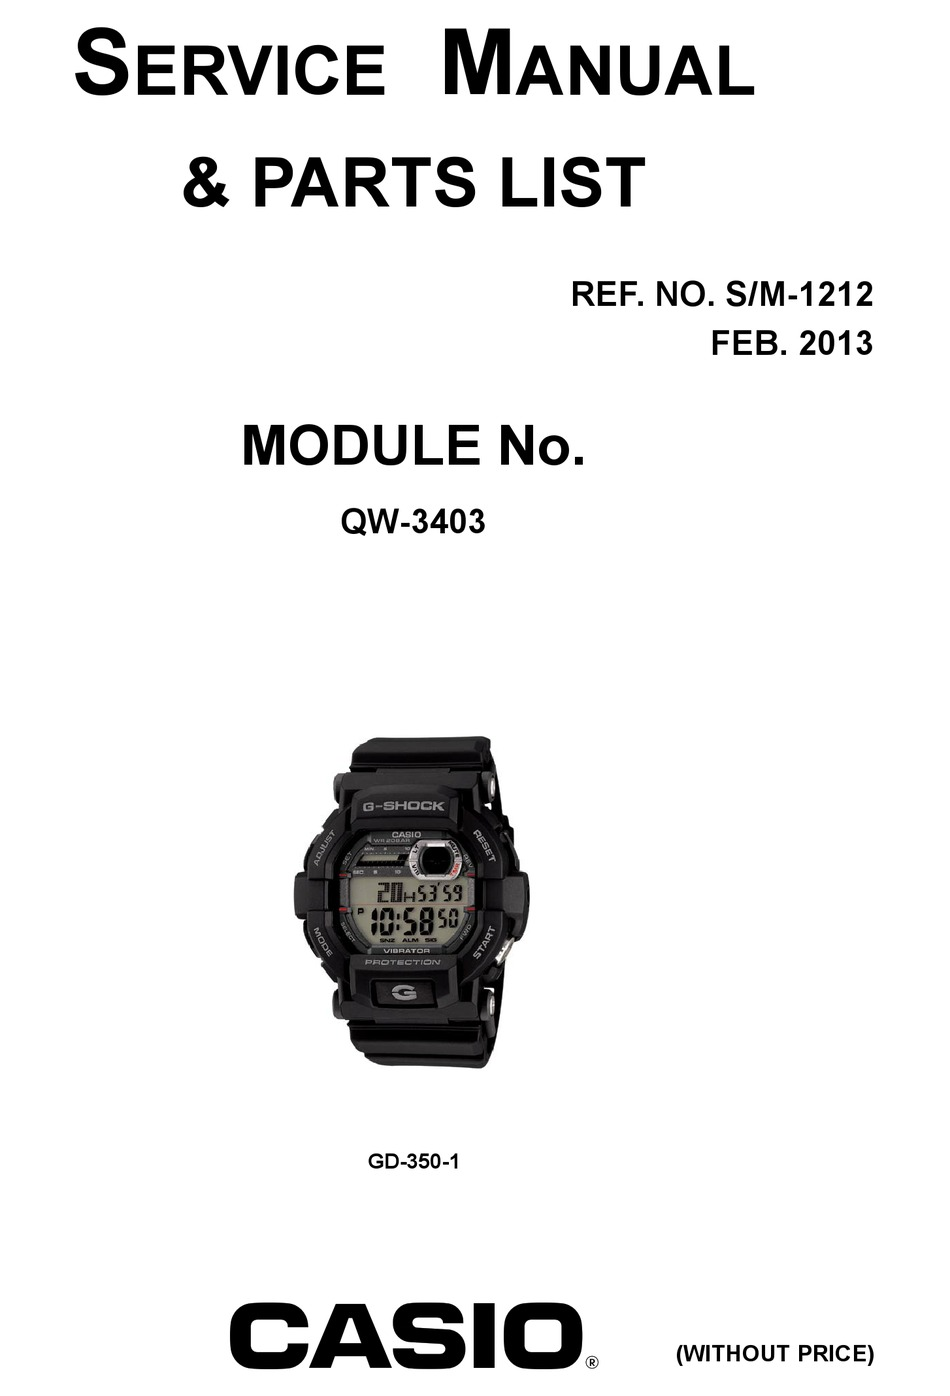 CASIO G-SHOCK QW-3403 SERVICE MANUAL & PARTS LIST Pdf